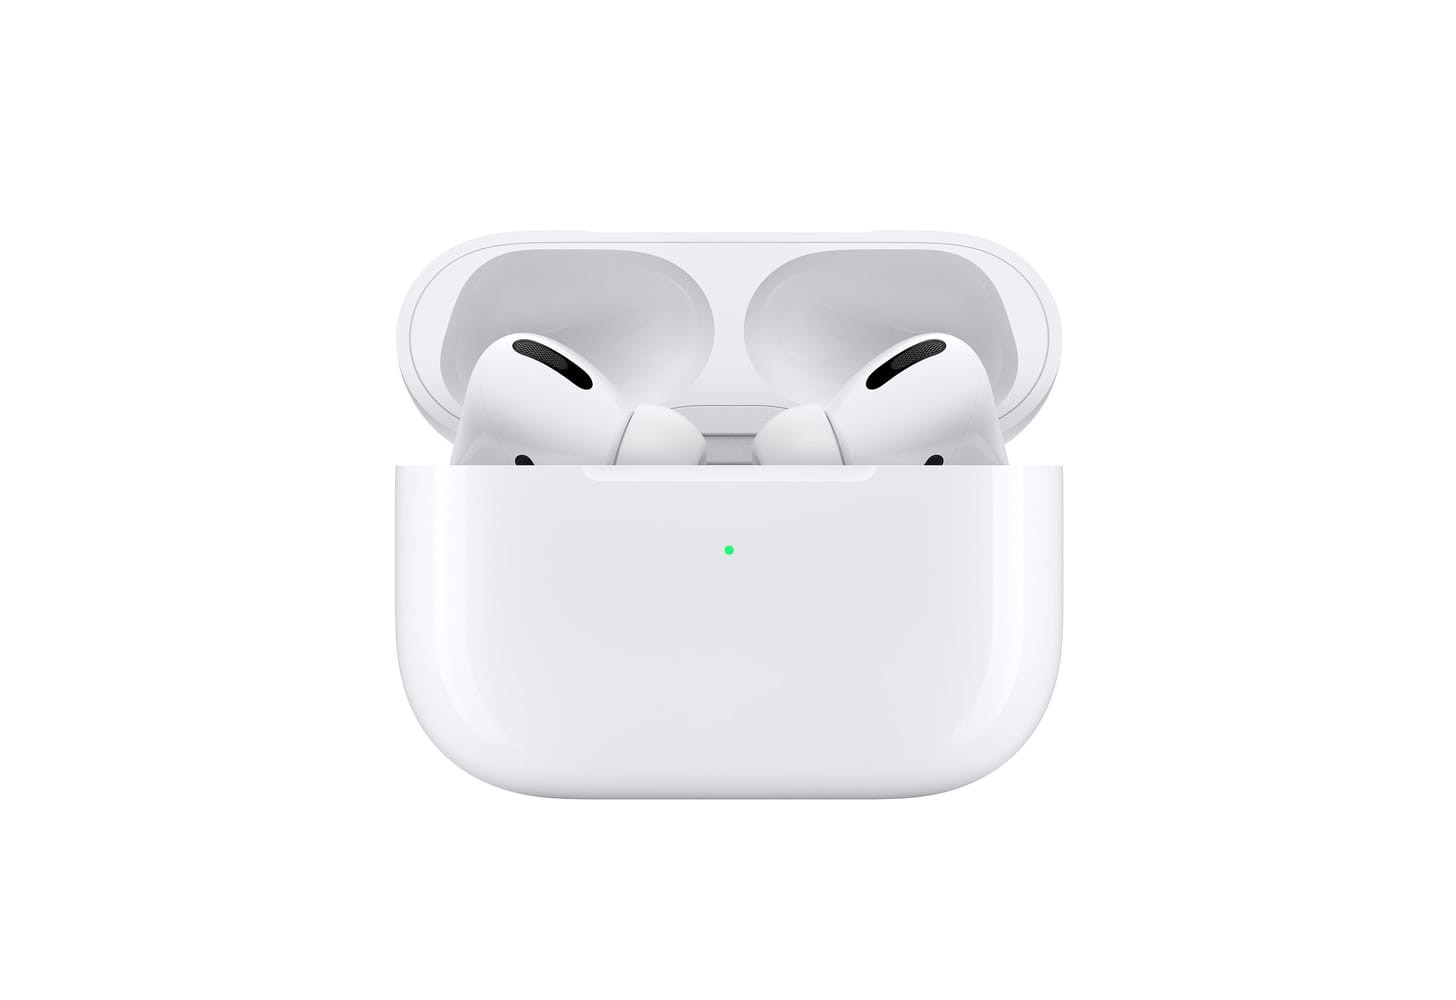 apple-airpods-pro-3.jpg